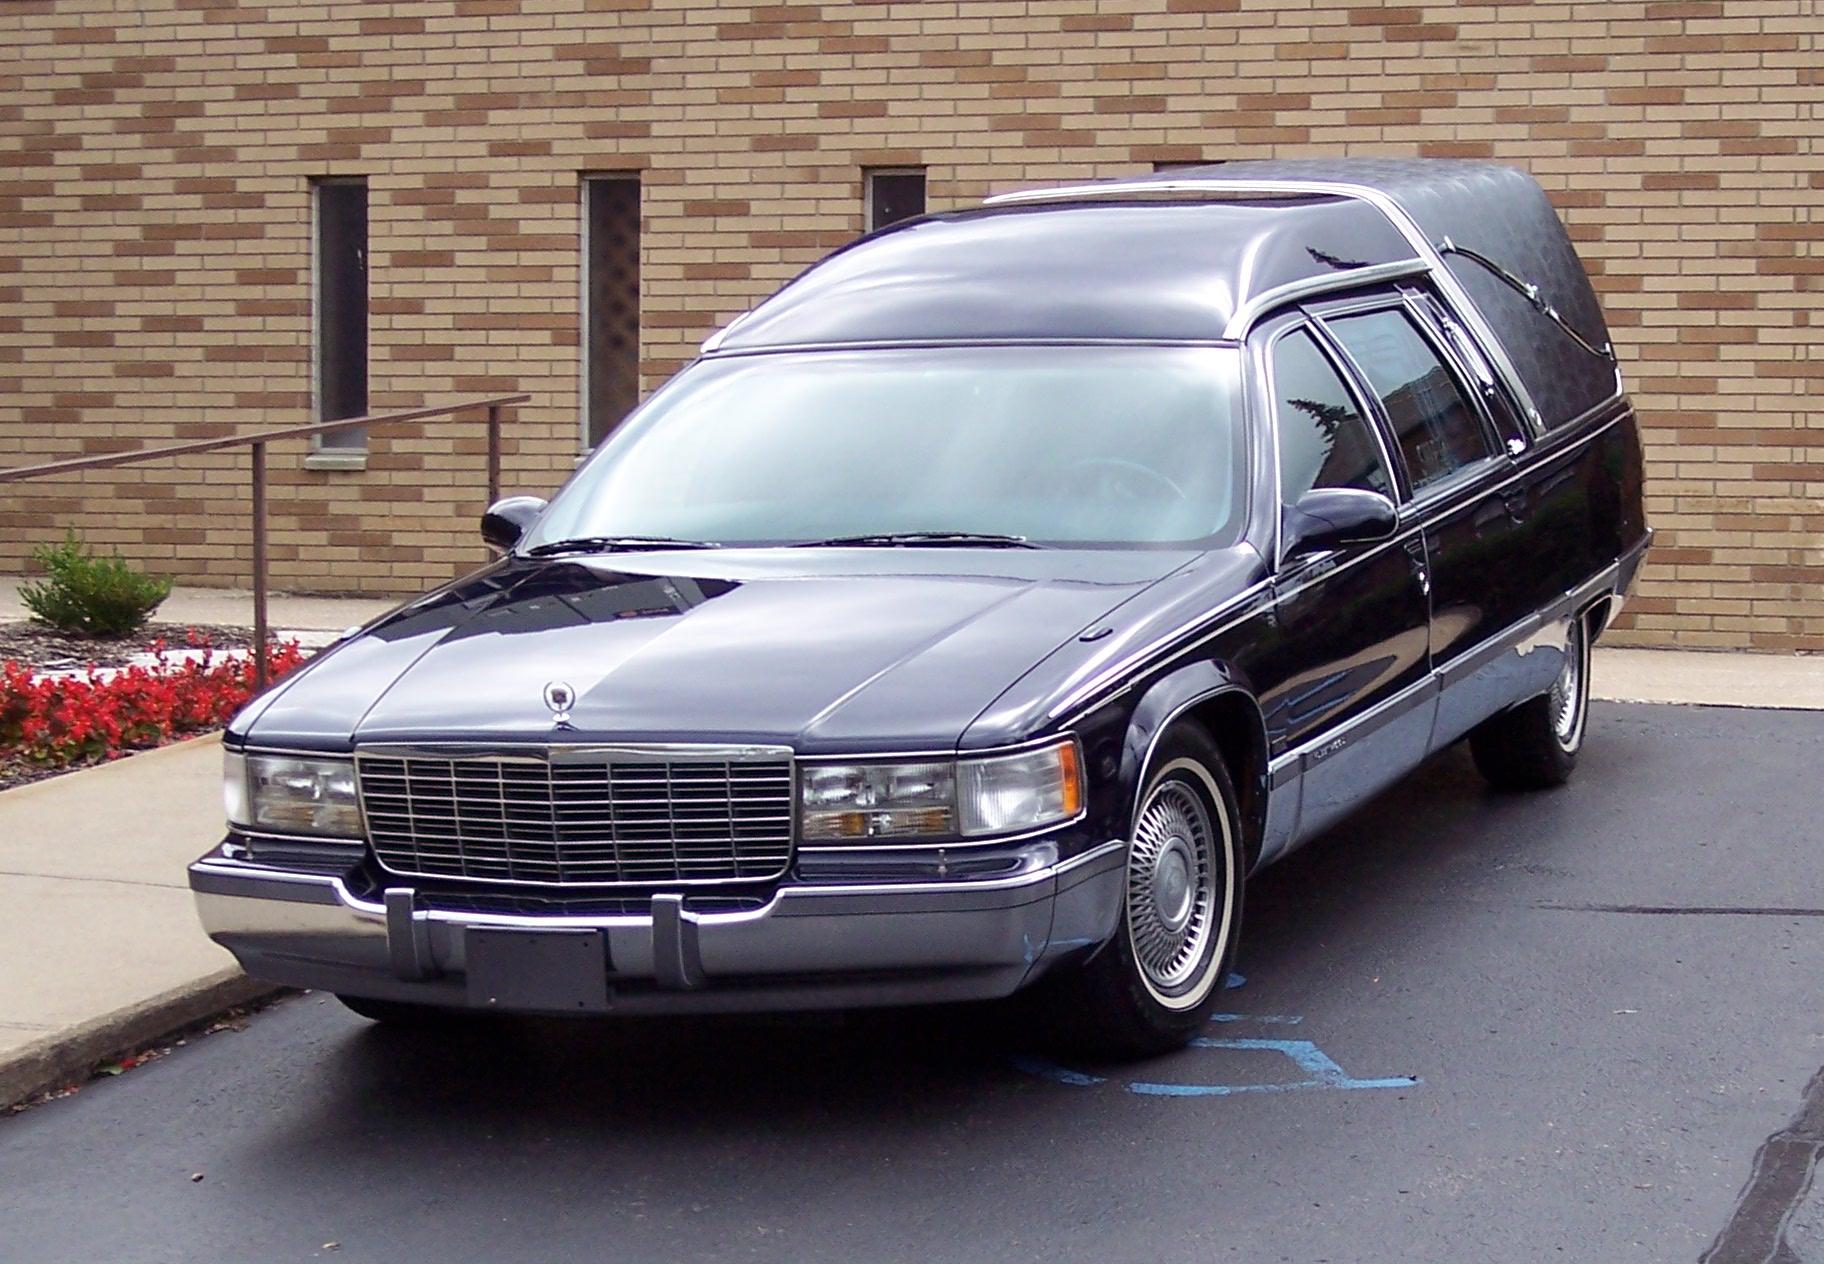 coches funebres antiguos: